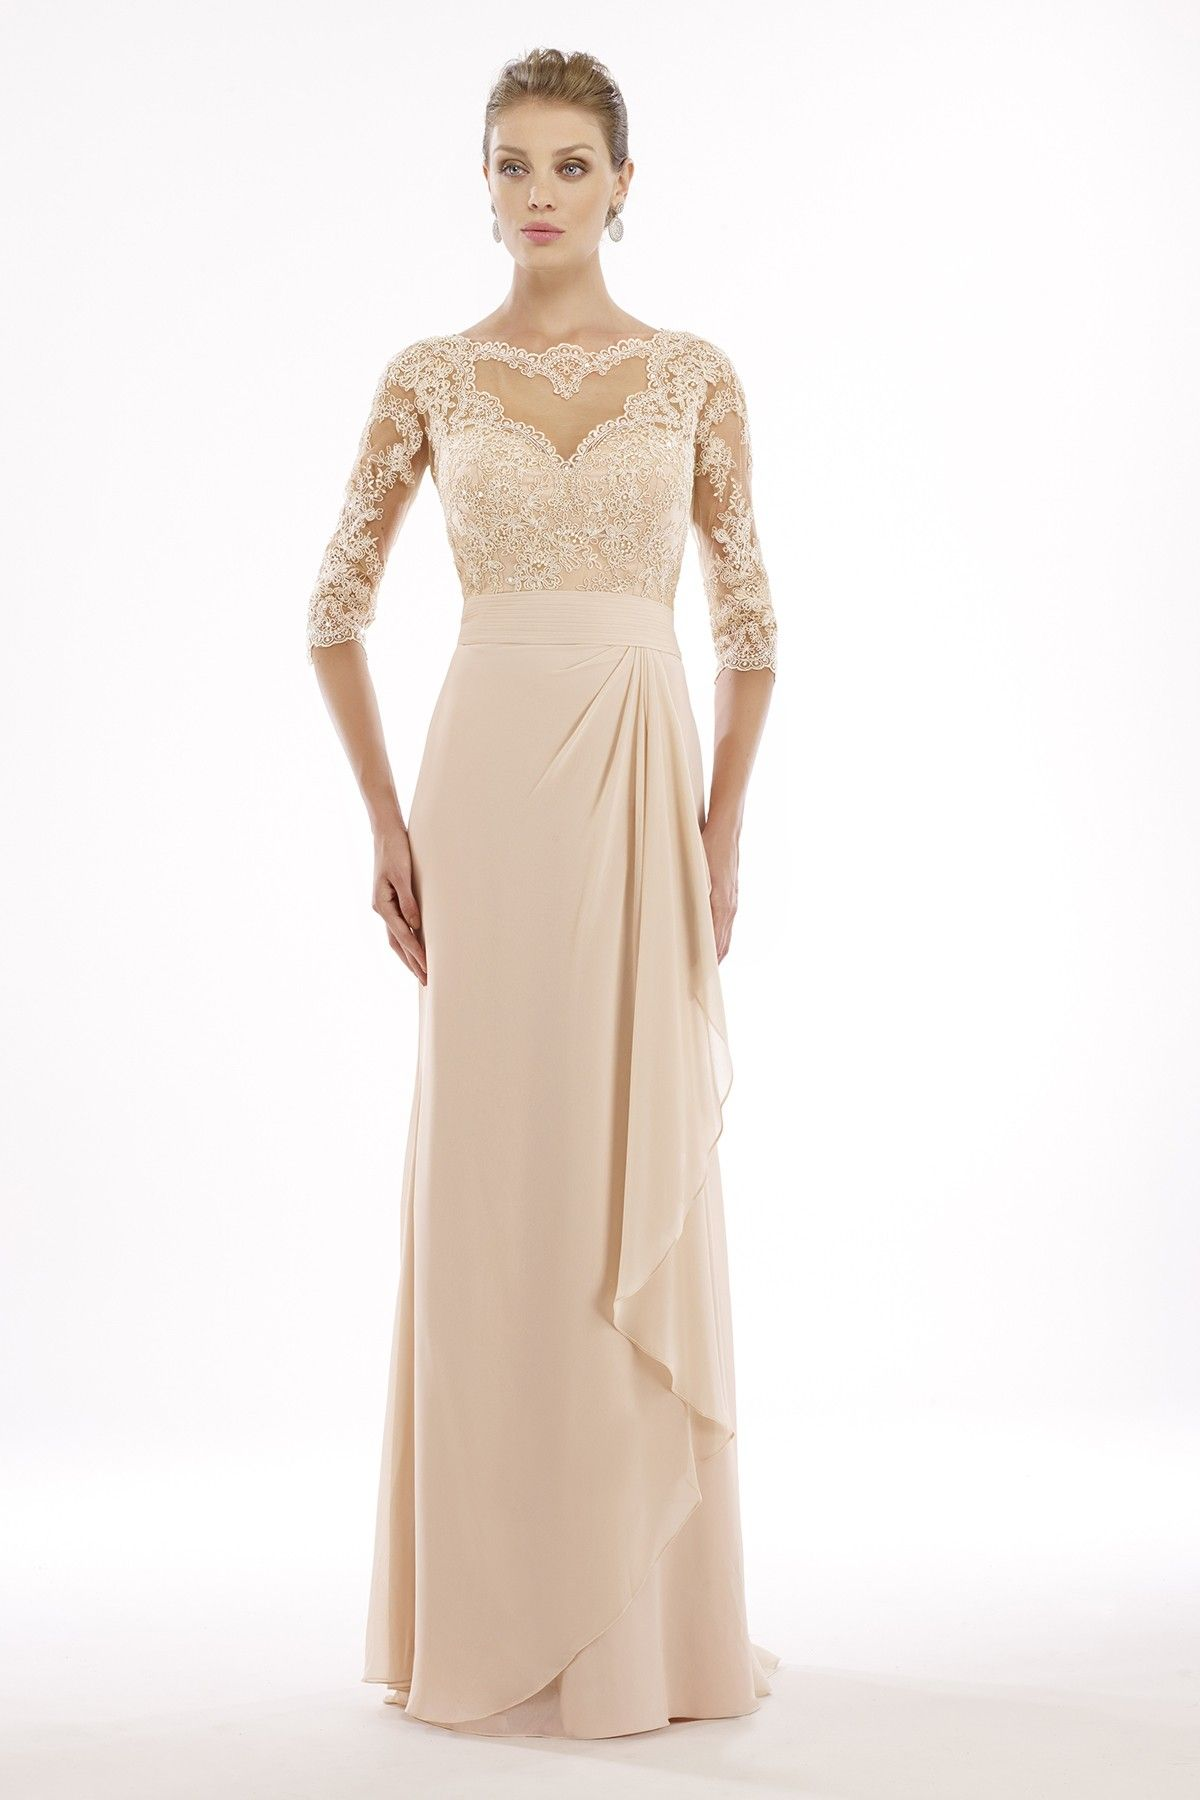 Platinum edition wedding dresses  SheathColumn Illusion Floor Length Chiffon Silver Cloud Half Sleeve